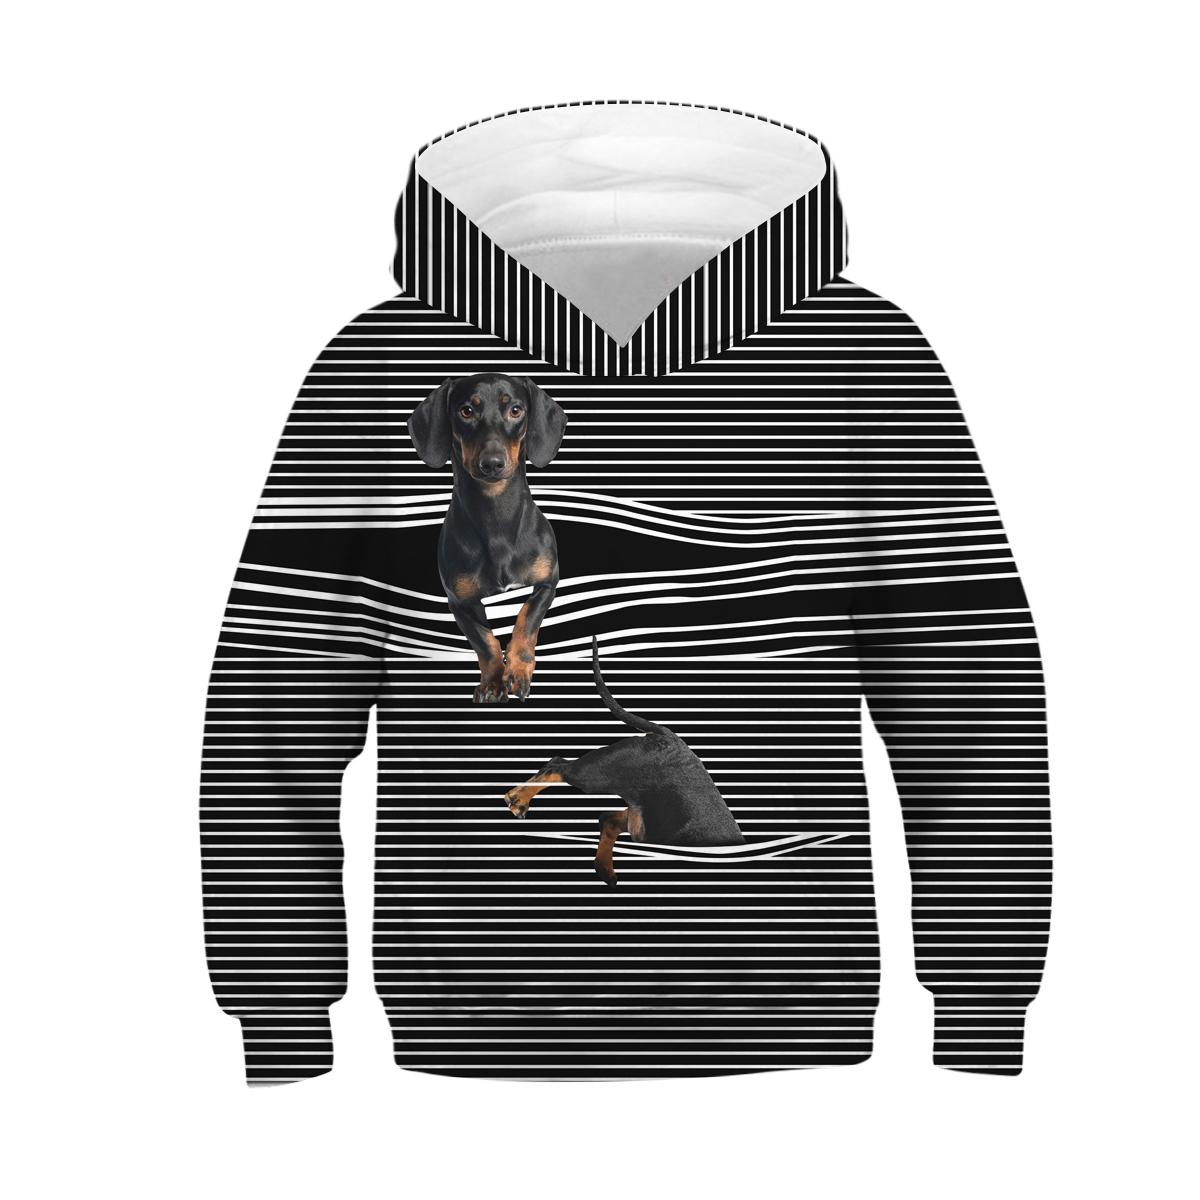 New Dog Window 후드 티 후드 티셔츠 3d 프린트 Hoody Casual Pullovers Streetwear 탑스 가을 정규식 힙합 힙합